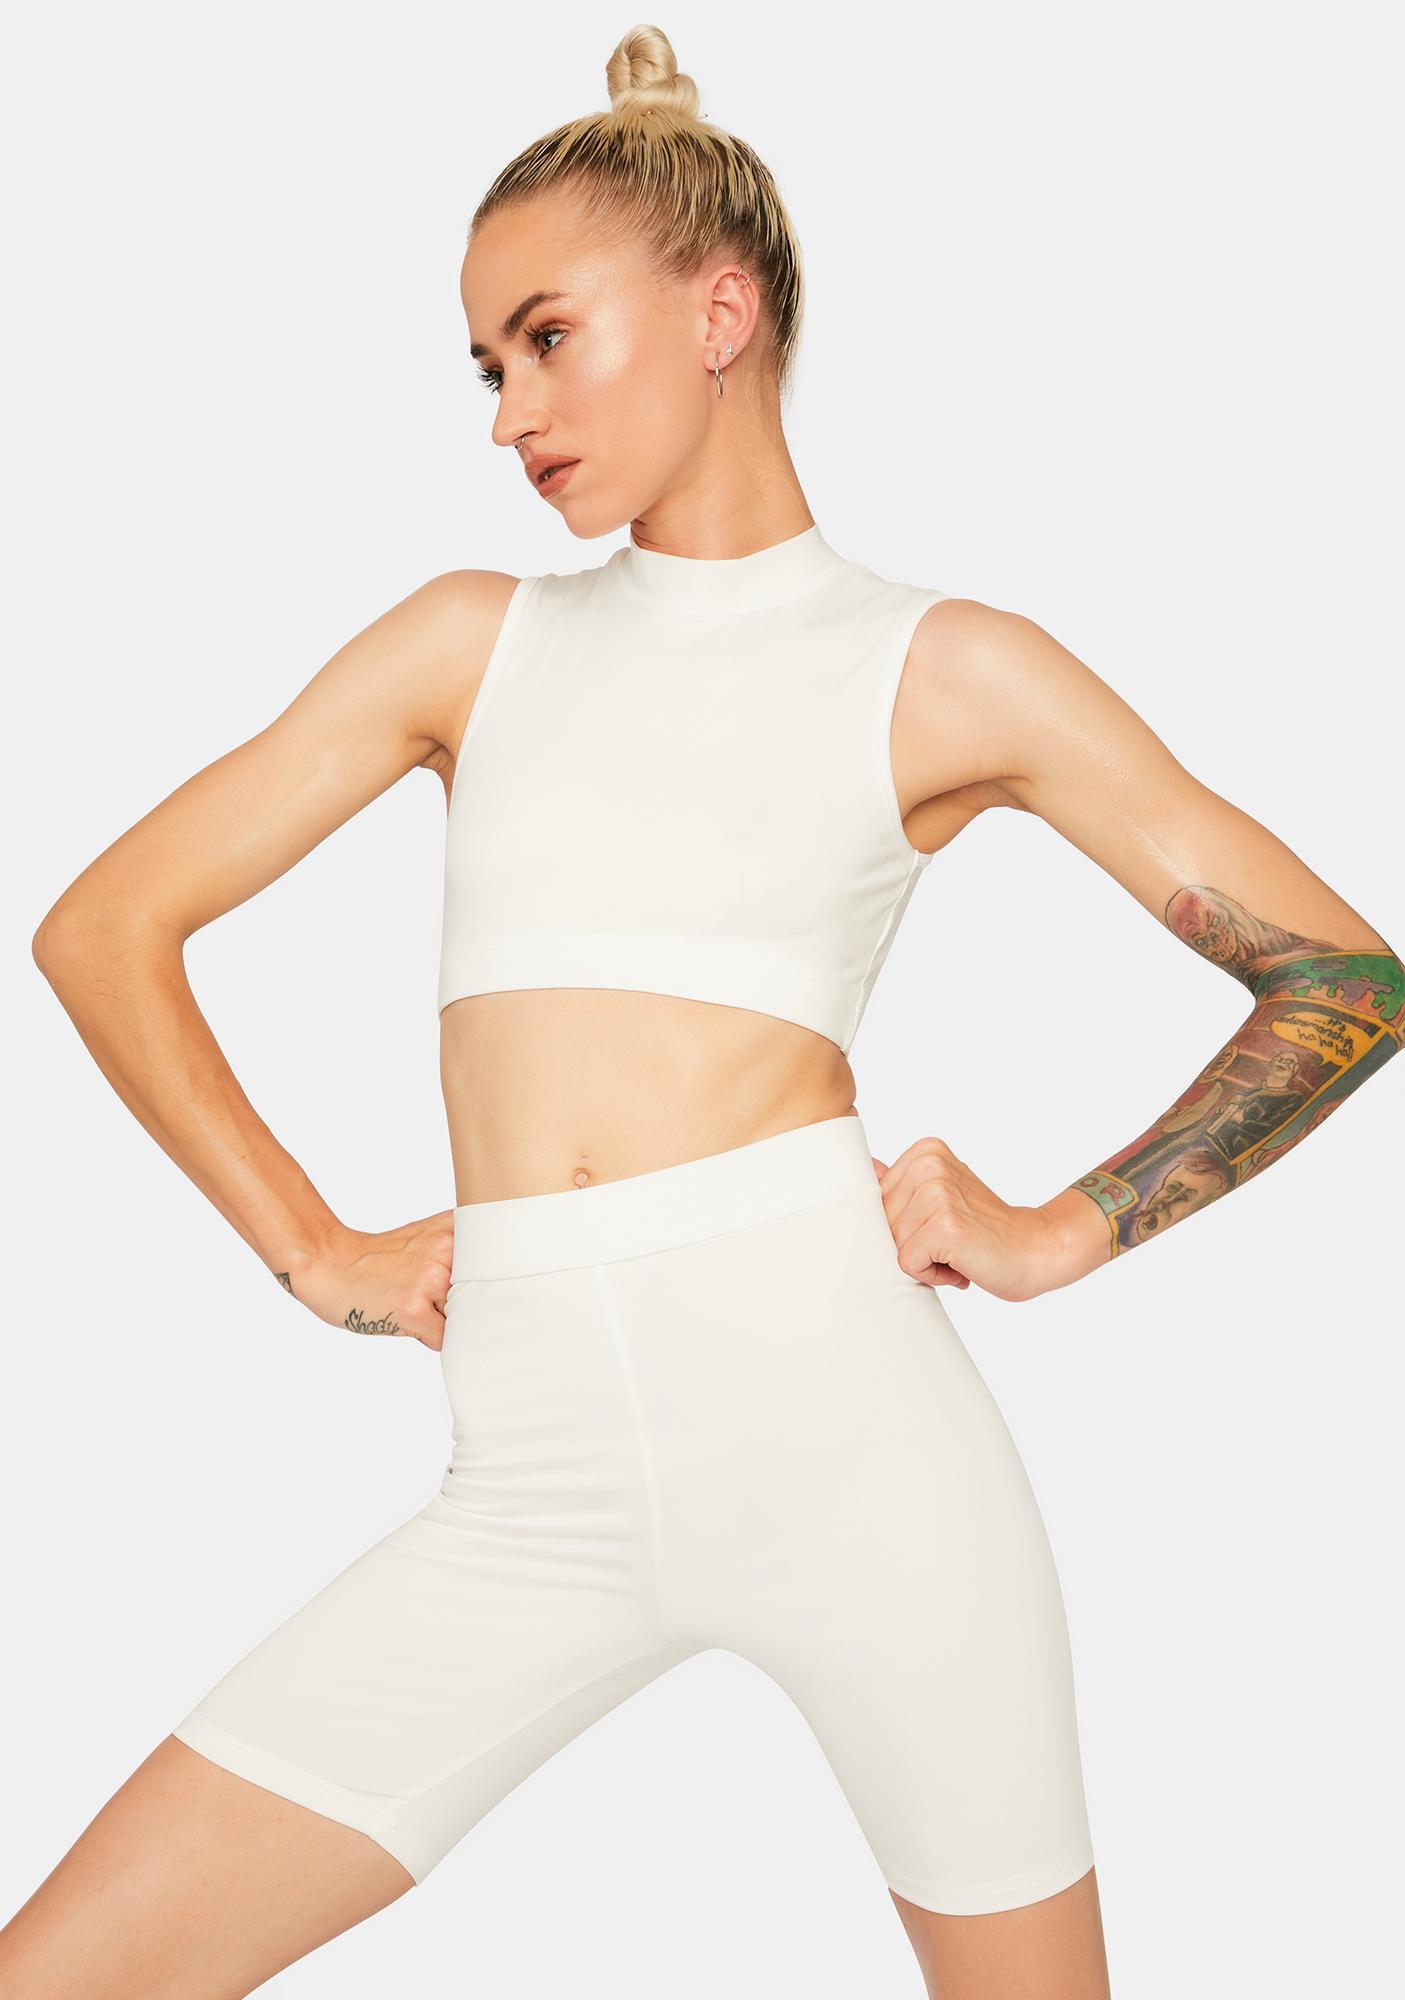 Model Uncover Biker Shorts Set